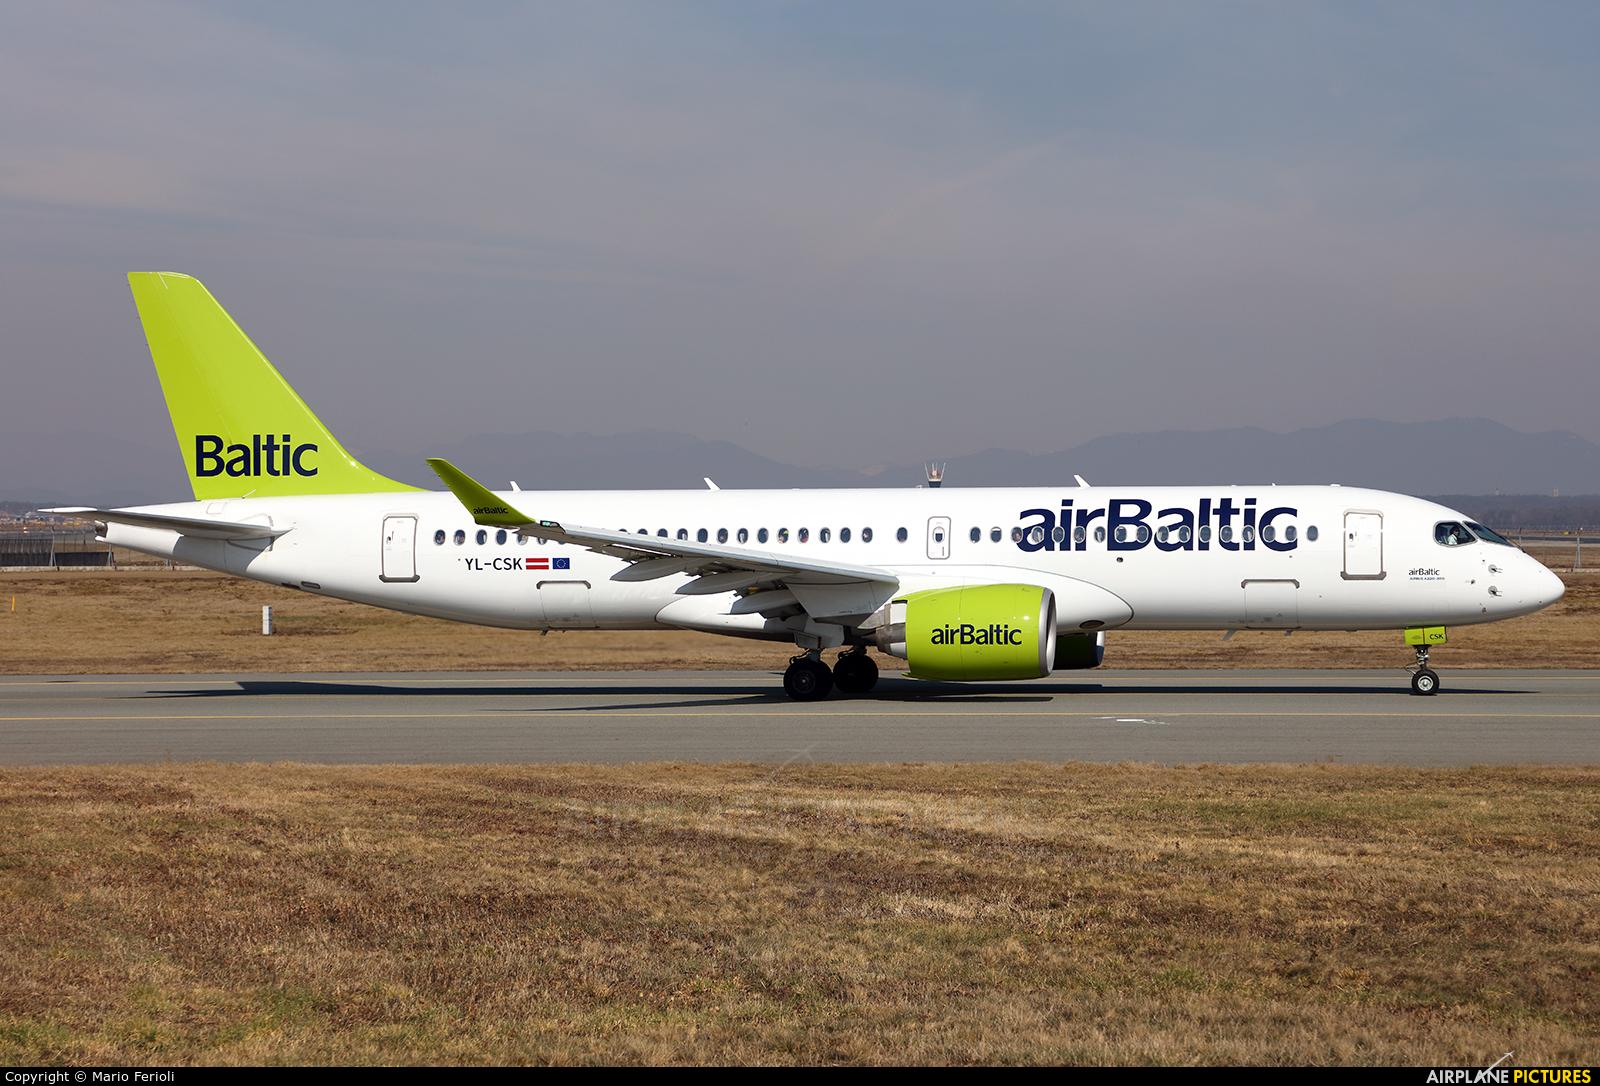 Air Baltic YL-CSK aircraft at Milan - Malpensa